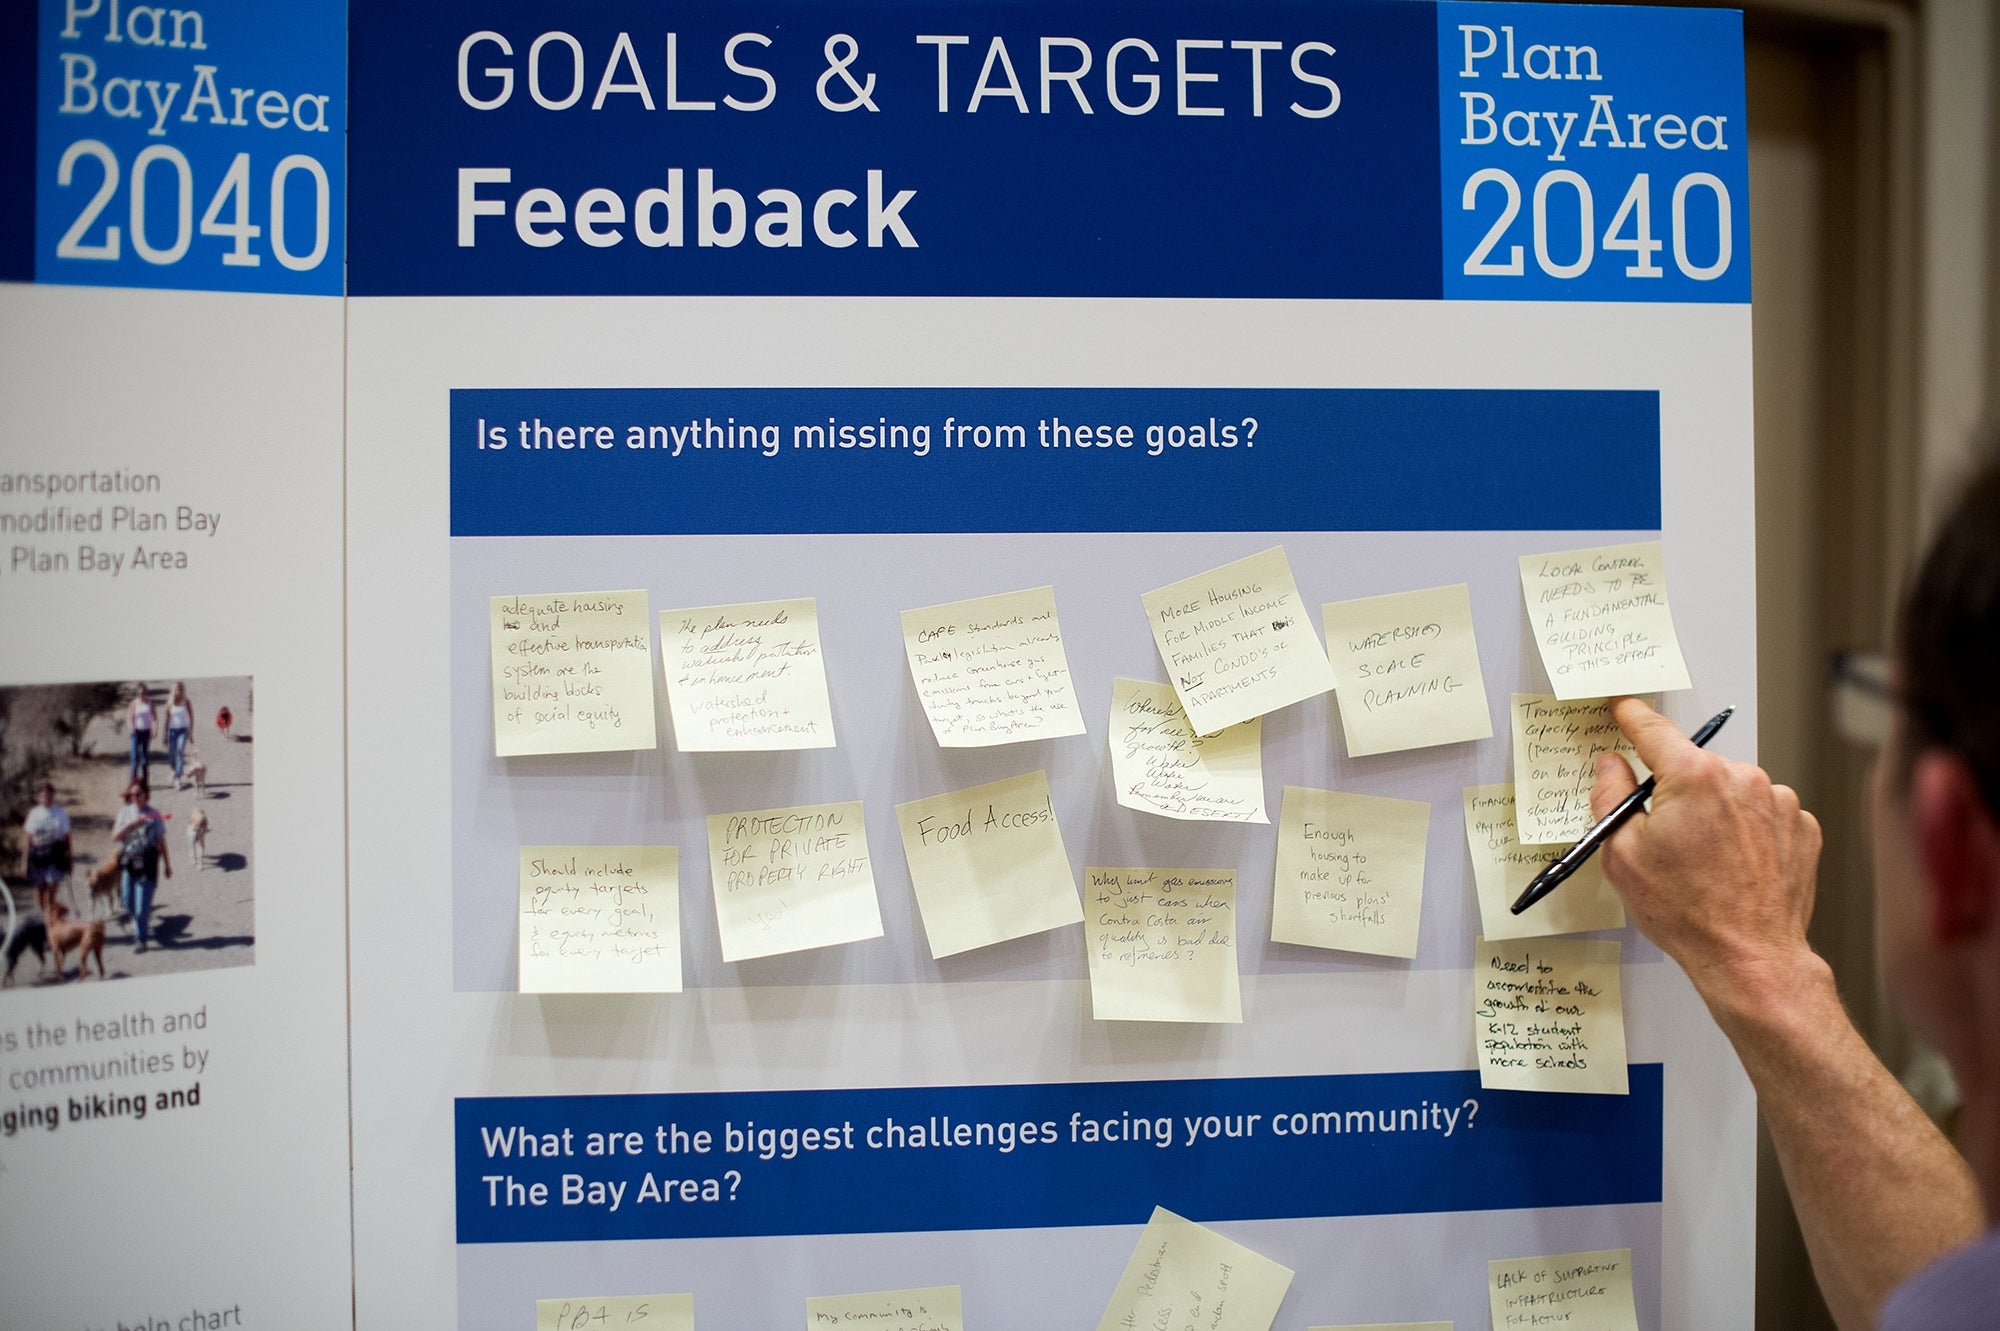 Participants pen ideas on sticky notes